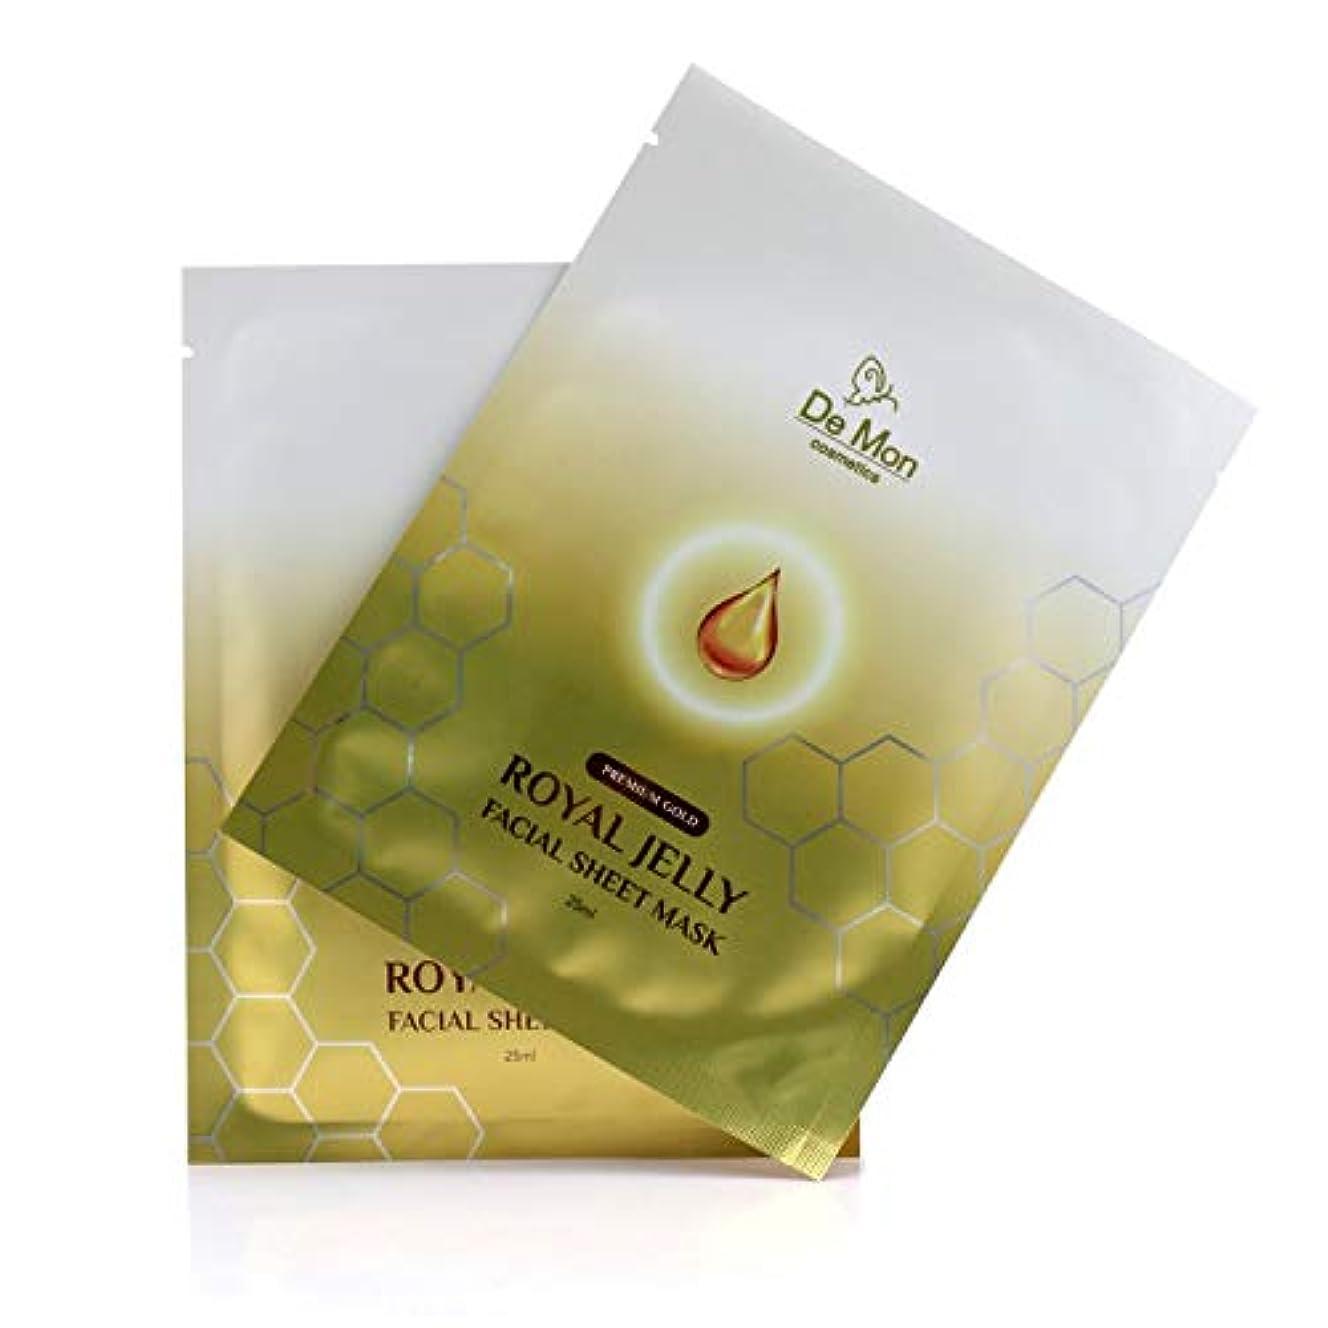 DeMon Gold Royal Jelly Facial Sheet Mask 5x25ml/0.8oz並行輸入品